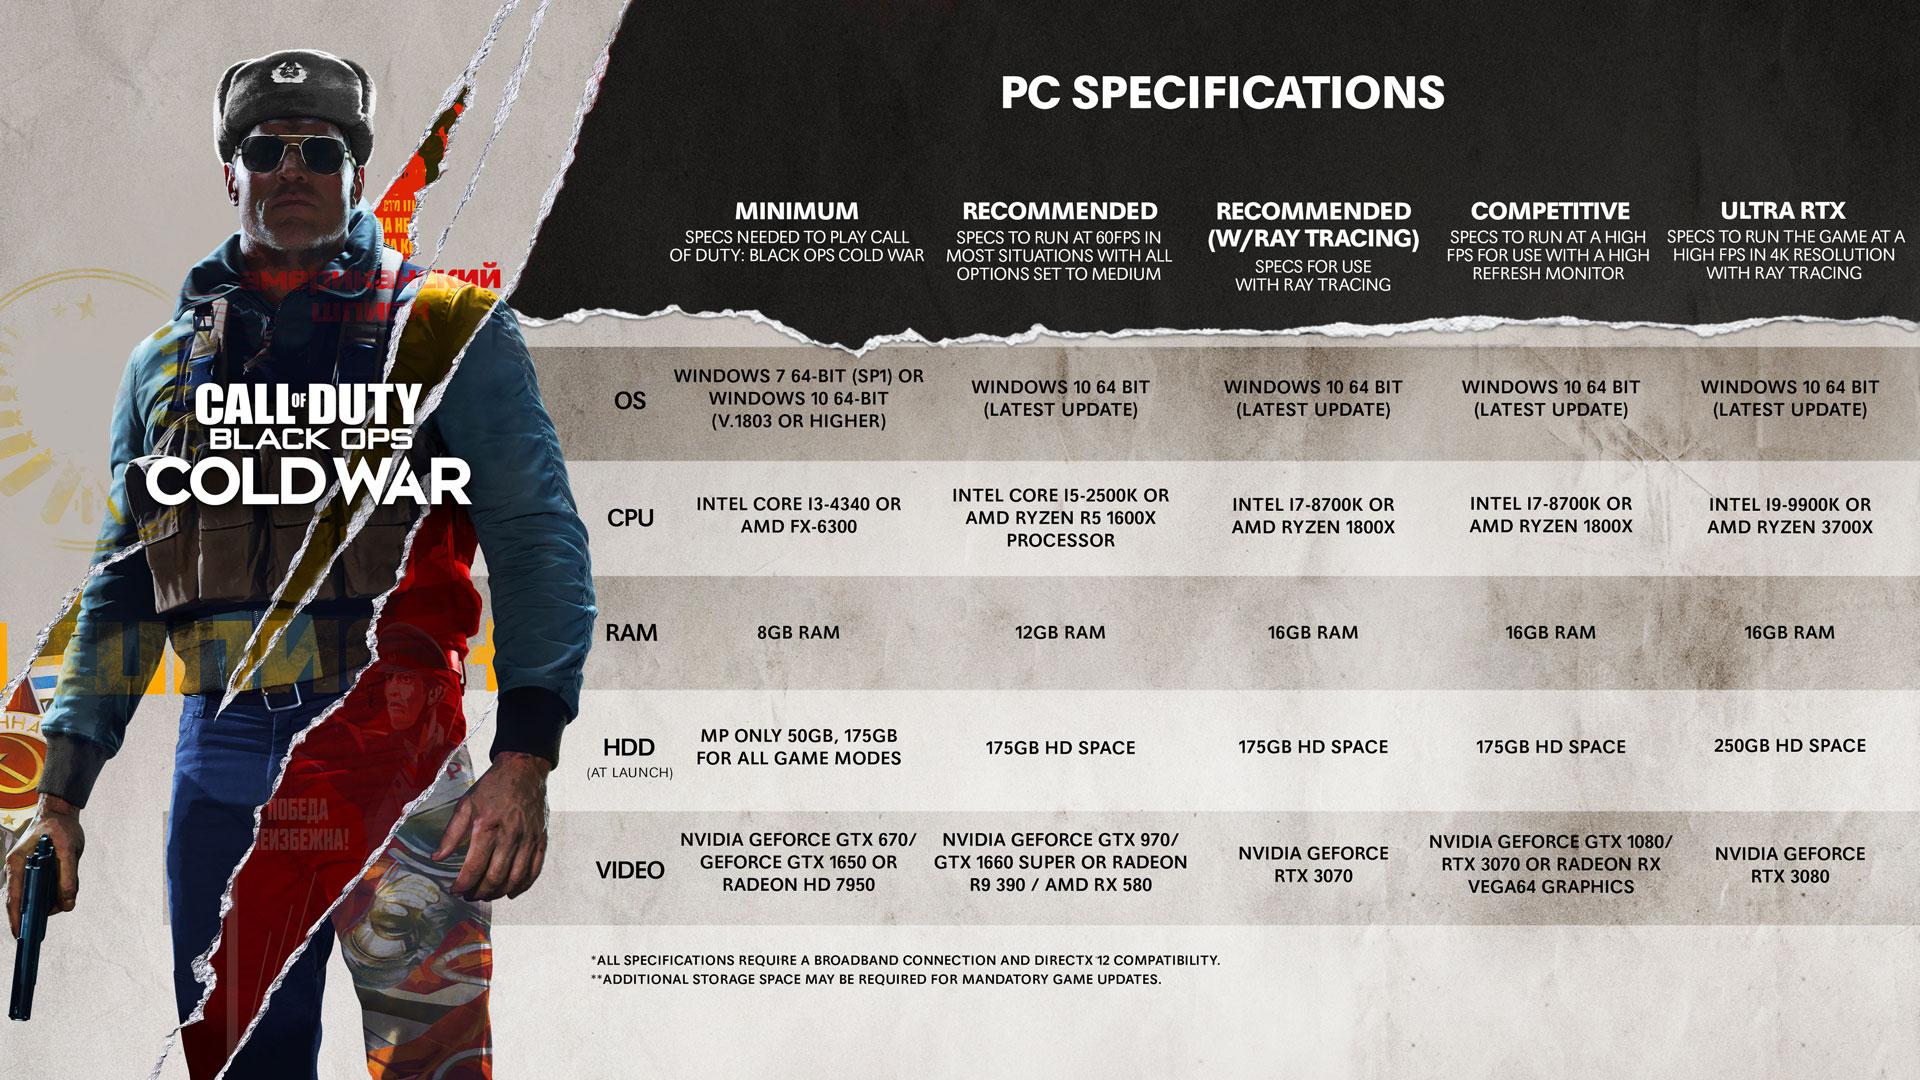 HW požadavky a PC trailer COD: Black Ops Cold War BOCW PC SPECS